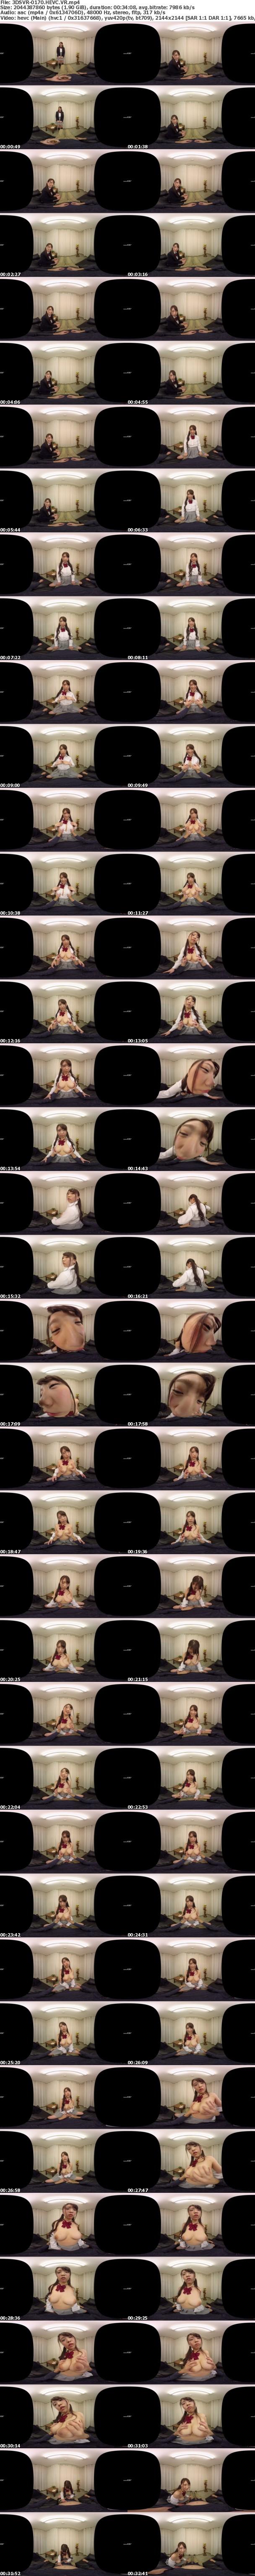 VR/3D 3DSVR-0170 【VR】女子○生おっパブ嬢 紗梨ちゃんと2人っきり お店にナイショのイケない初ヌキっ! 香坂紗梨